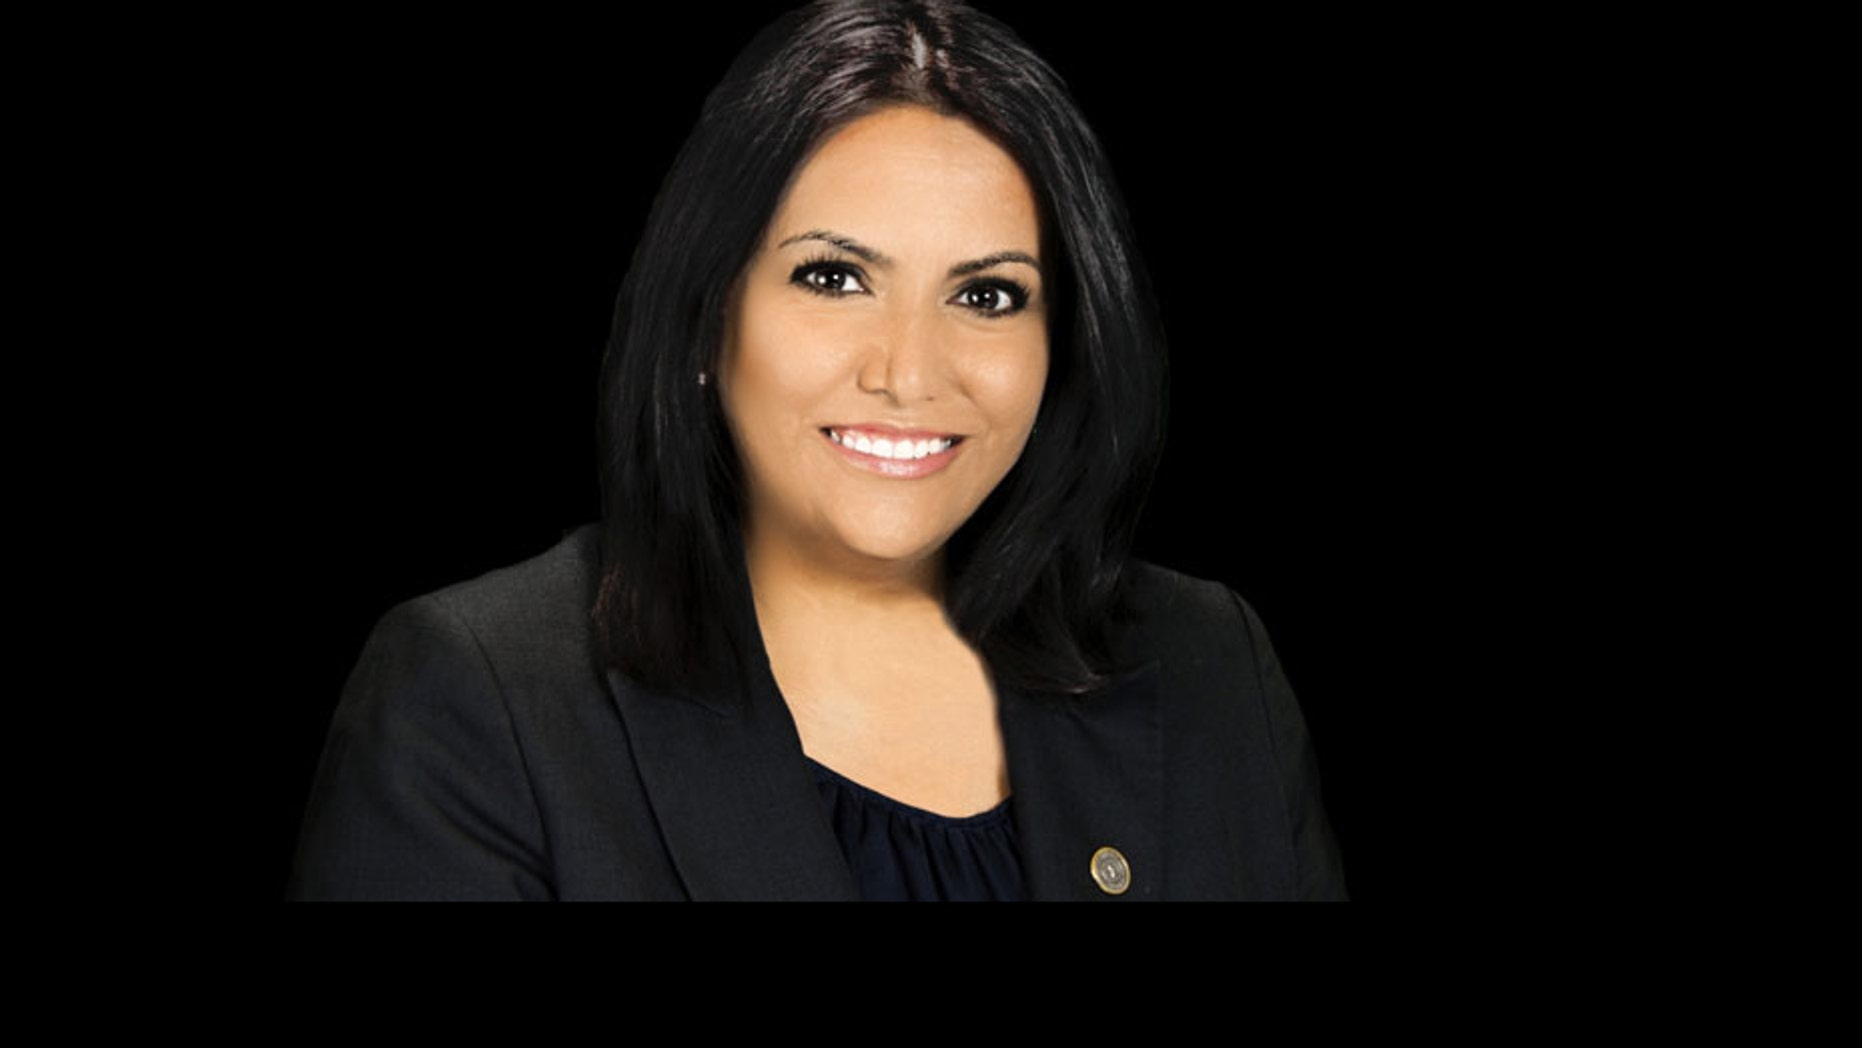 Farmers Branch City Councilwoman Ana Reyes